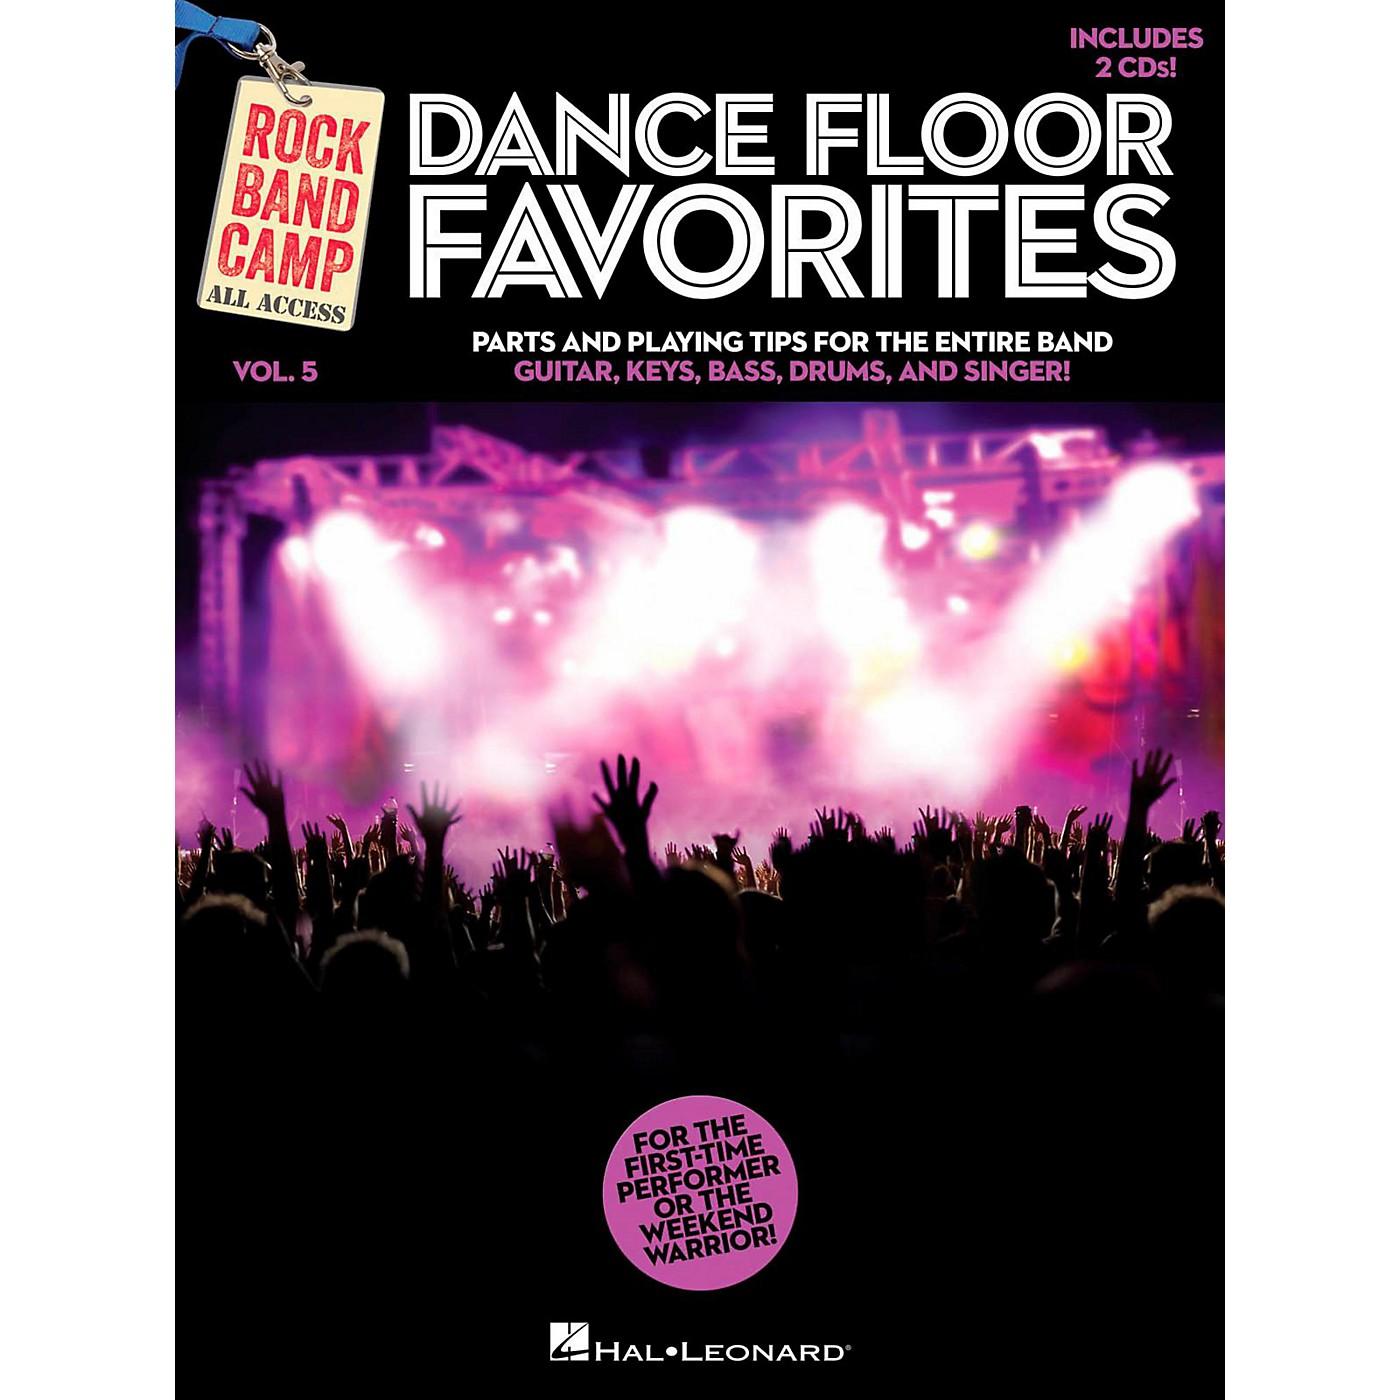 Hal Leonard Dance Floor Favorites - Rock Band Camp Vol. 5 (Book/2-CD Pack) Vocal Gtr Keys Bass Drums thumbnail